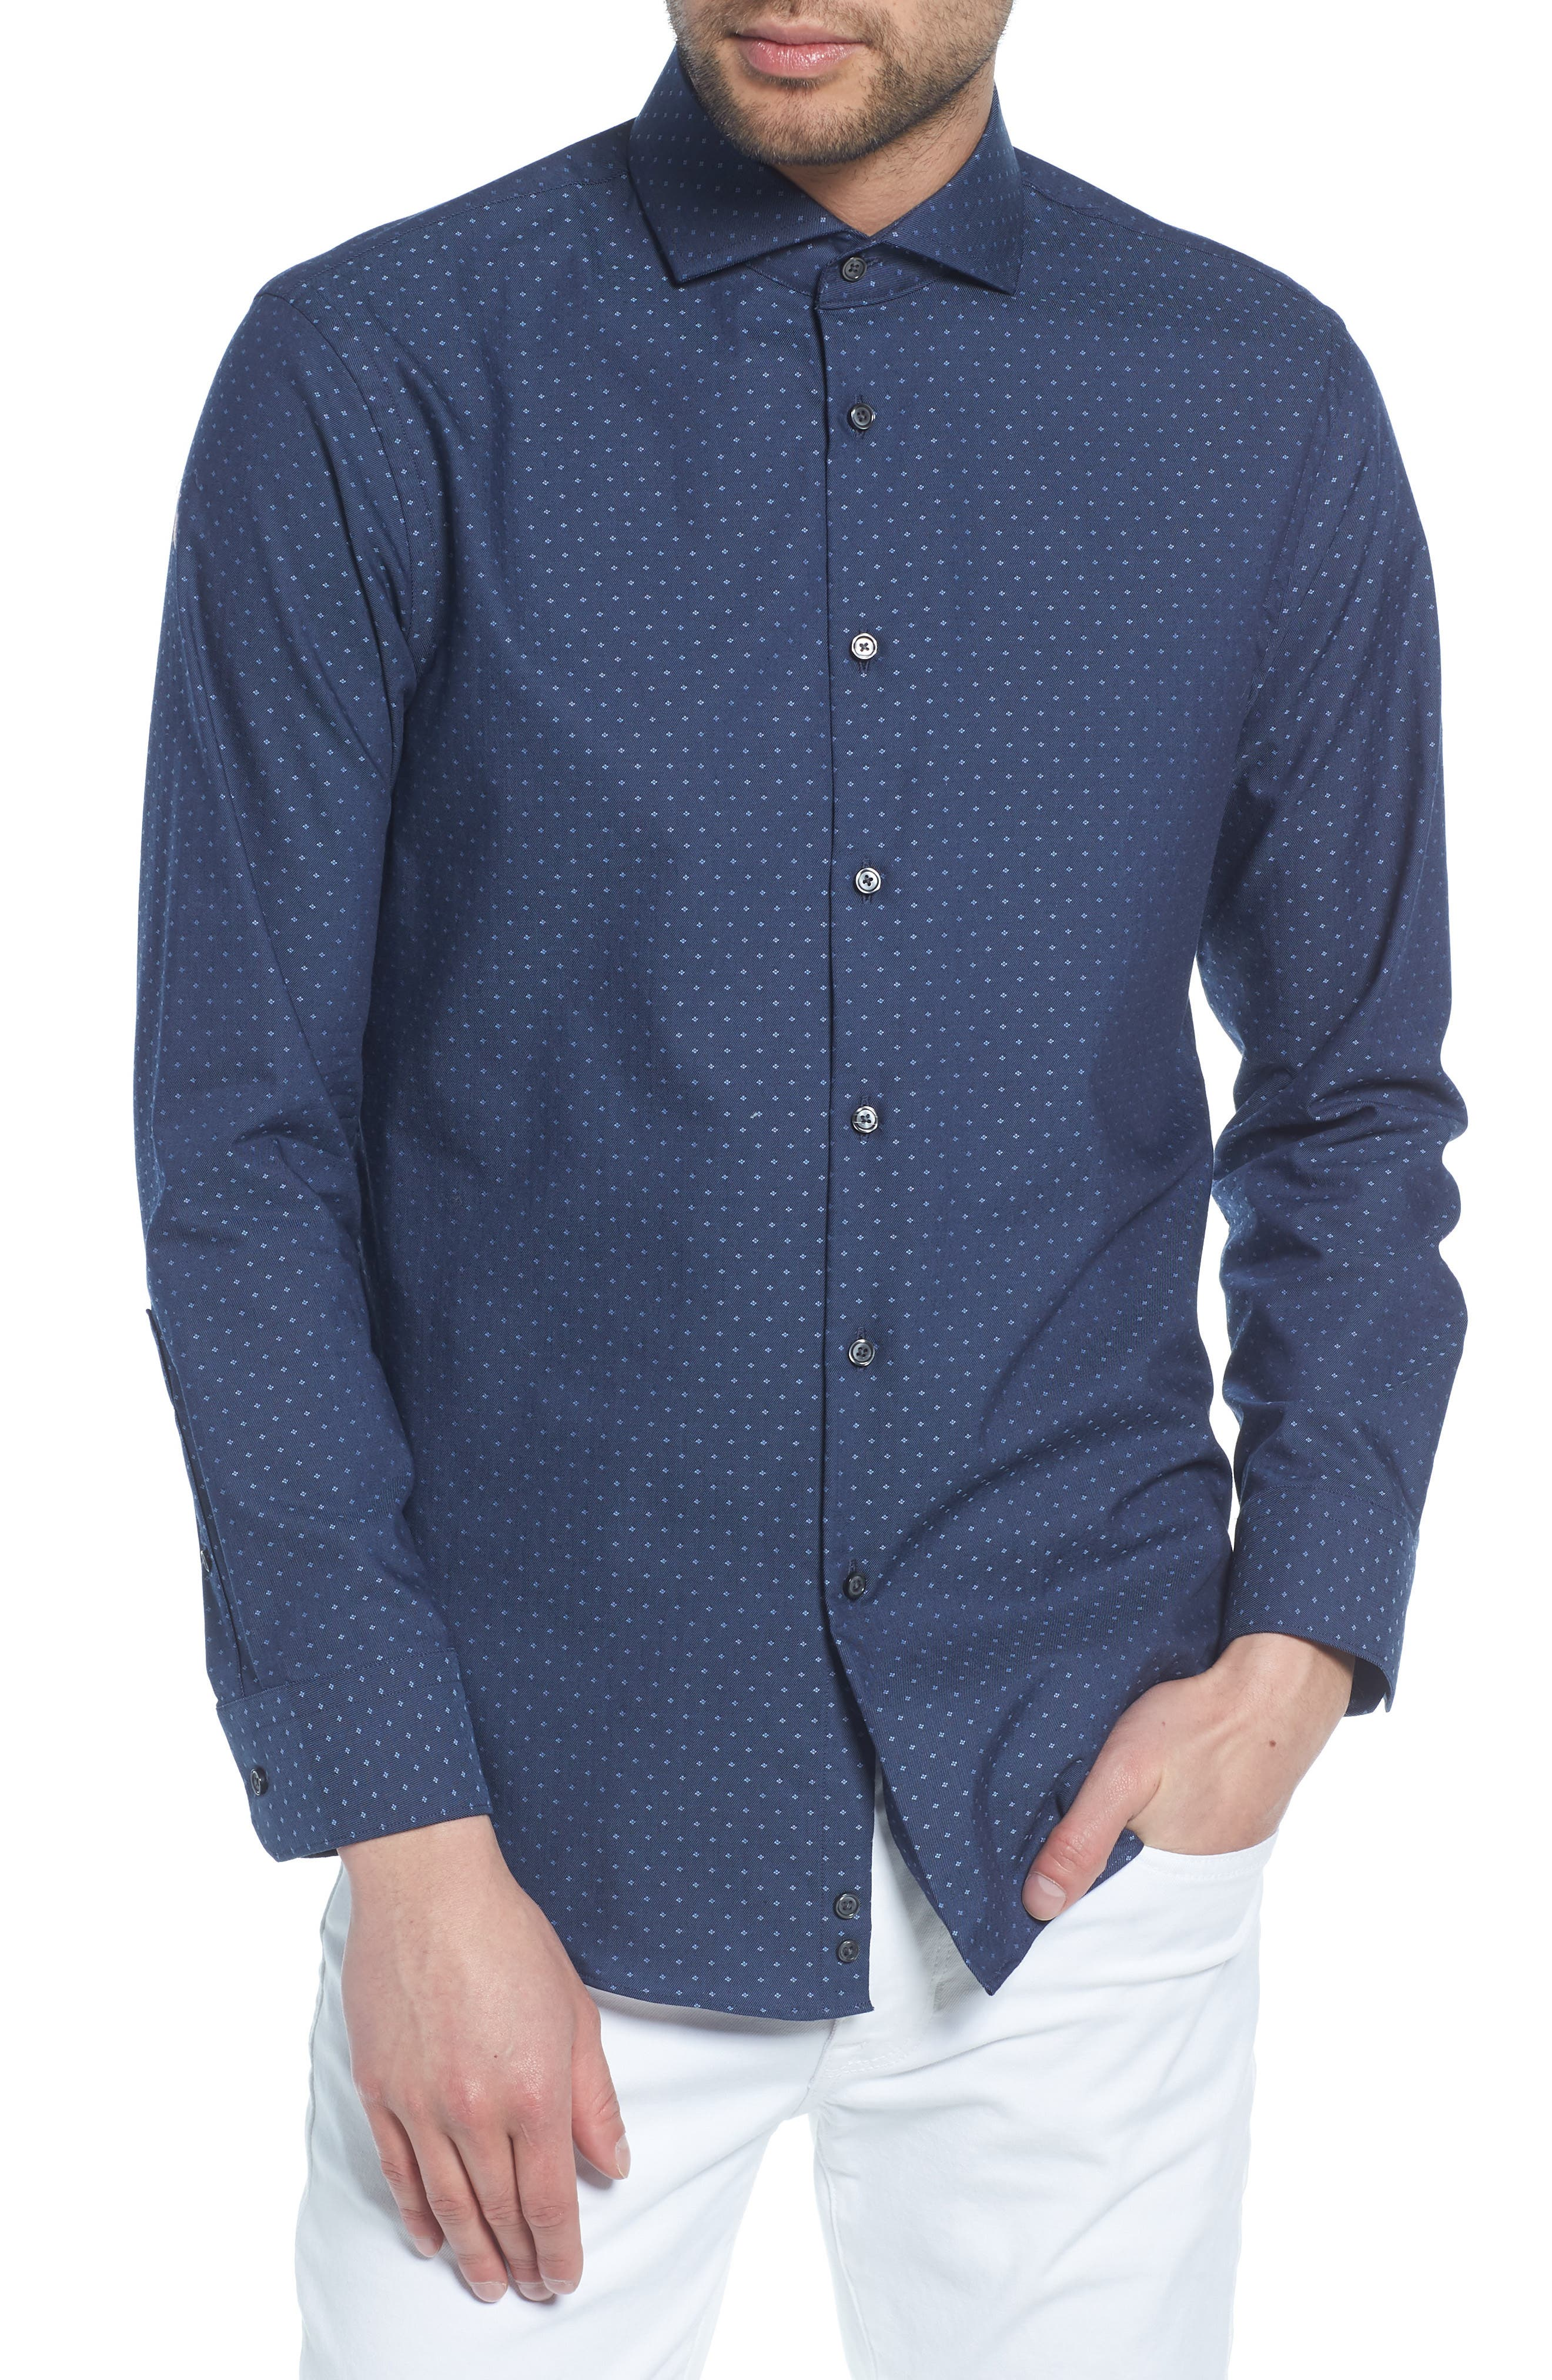 Extra Trim Fit Dot Dress Shirt,                             Main thumbnail 1, color,                             410